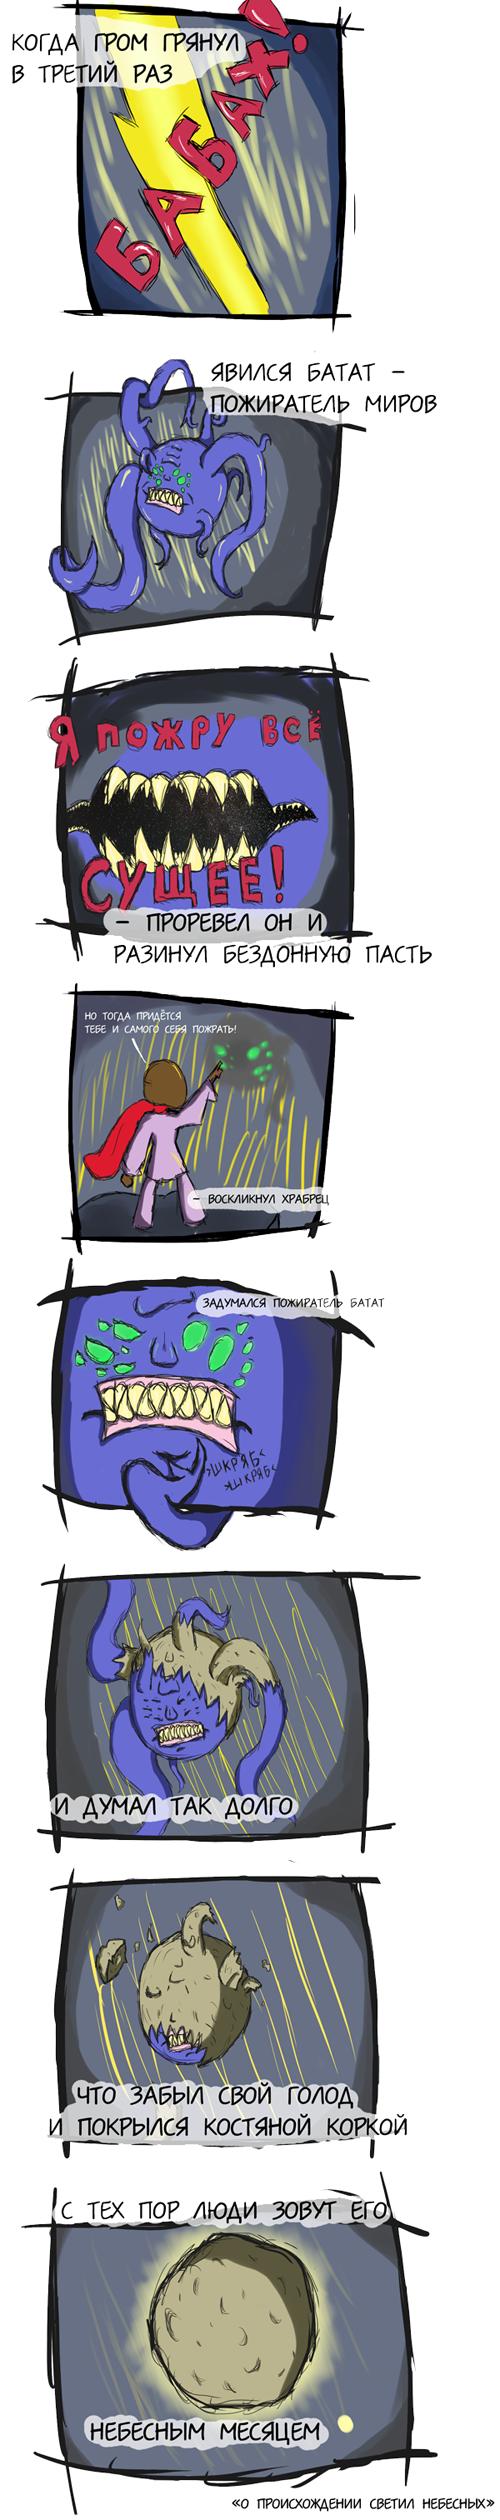 Комикс битва №16 выпуск 20